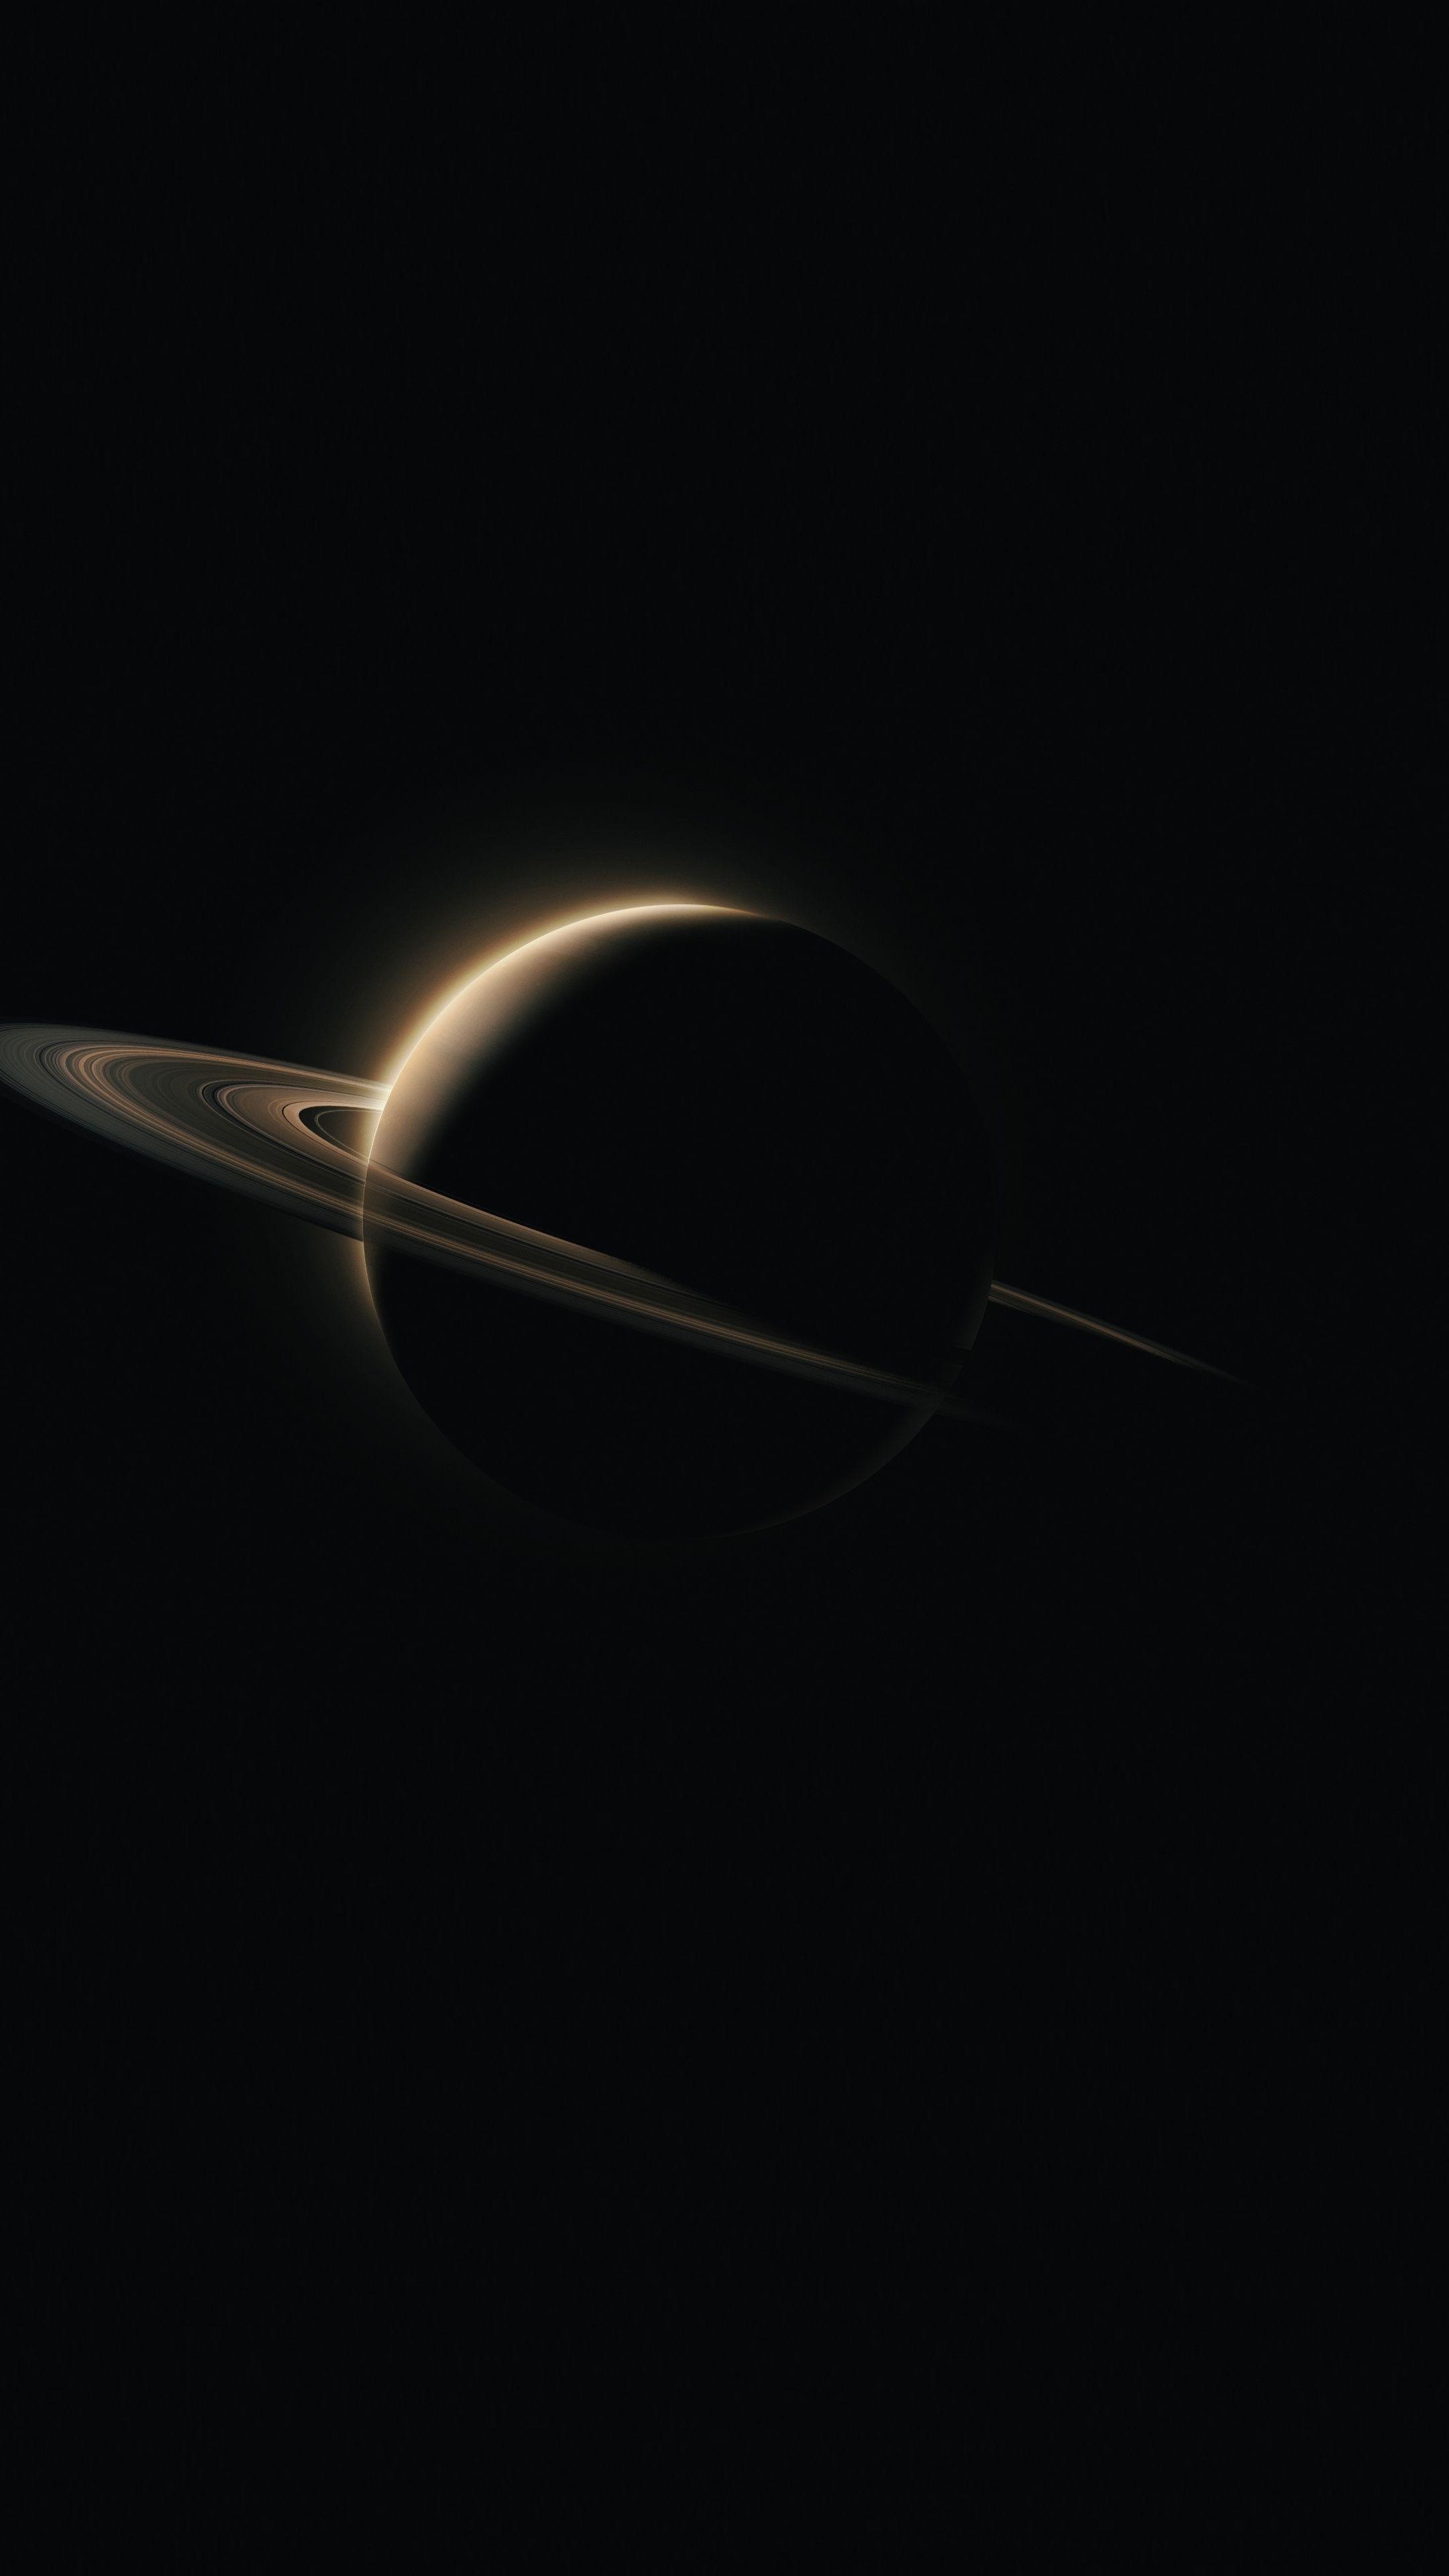 2160x3840 Saturn Planet Dark Wallpaper Space Phone Wallpaper Dark Phone Wallpapers Dark Wallpaper